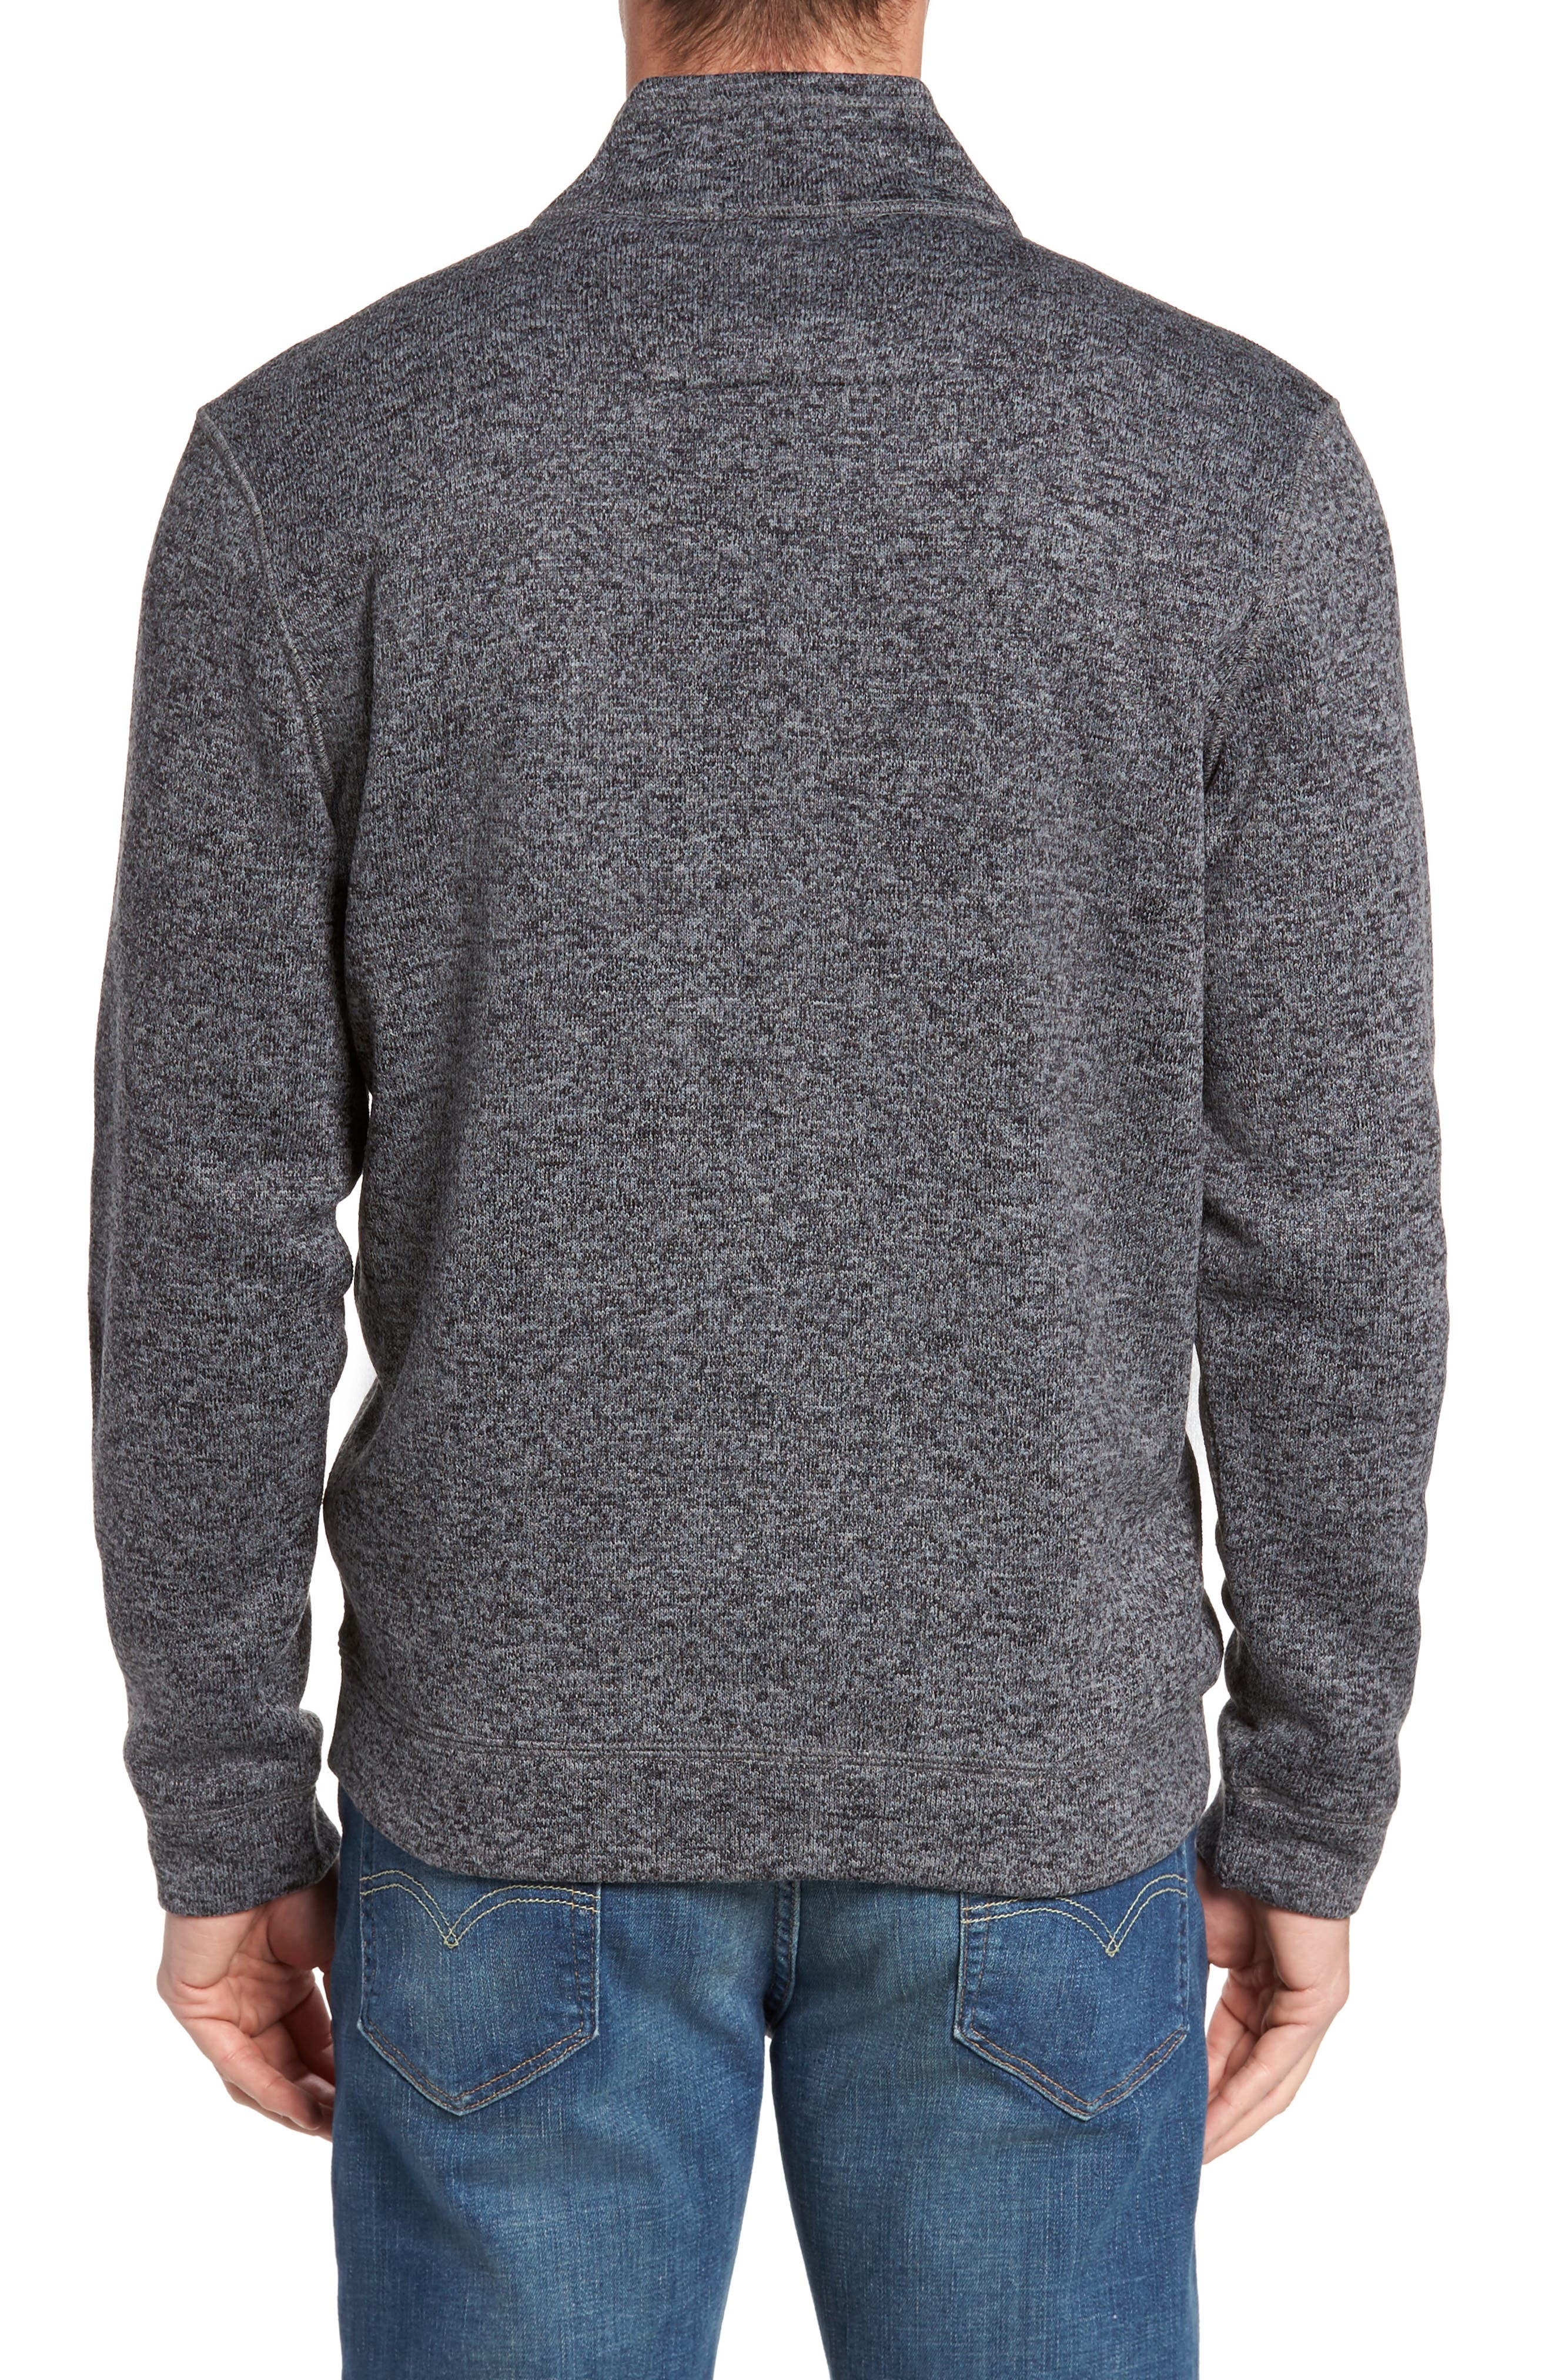 Sweater Knit Fleece Zip Front Jacket,                             Alternate thumbnail 2, color,                             Black/ Grey